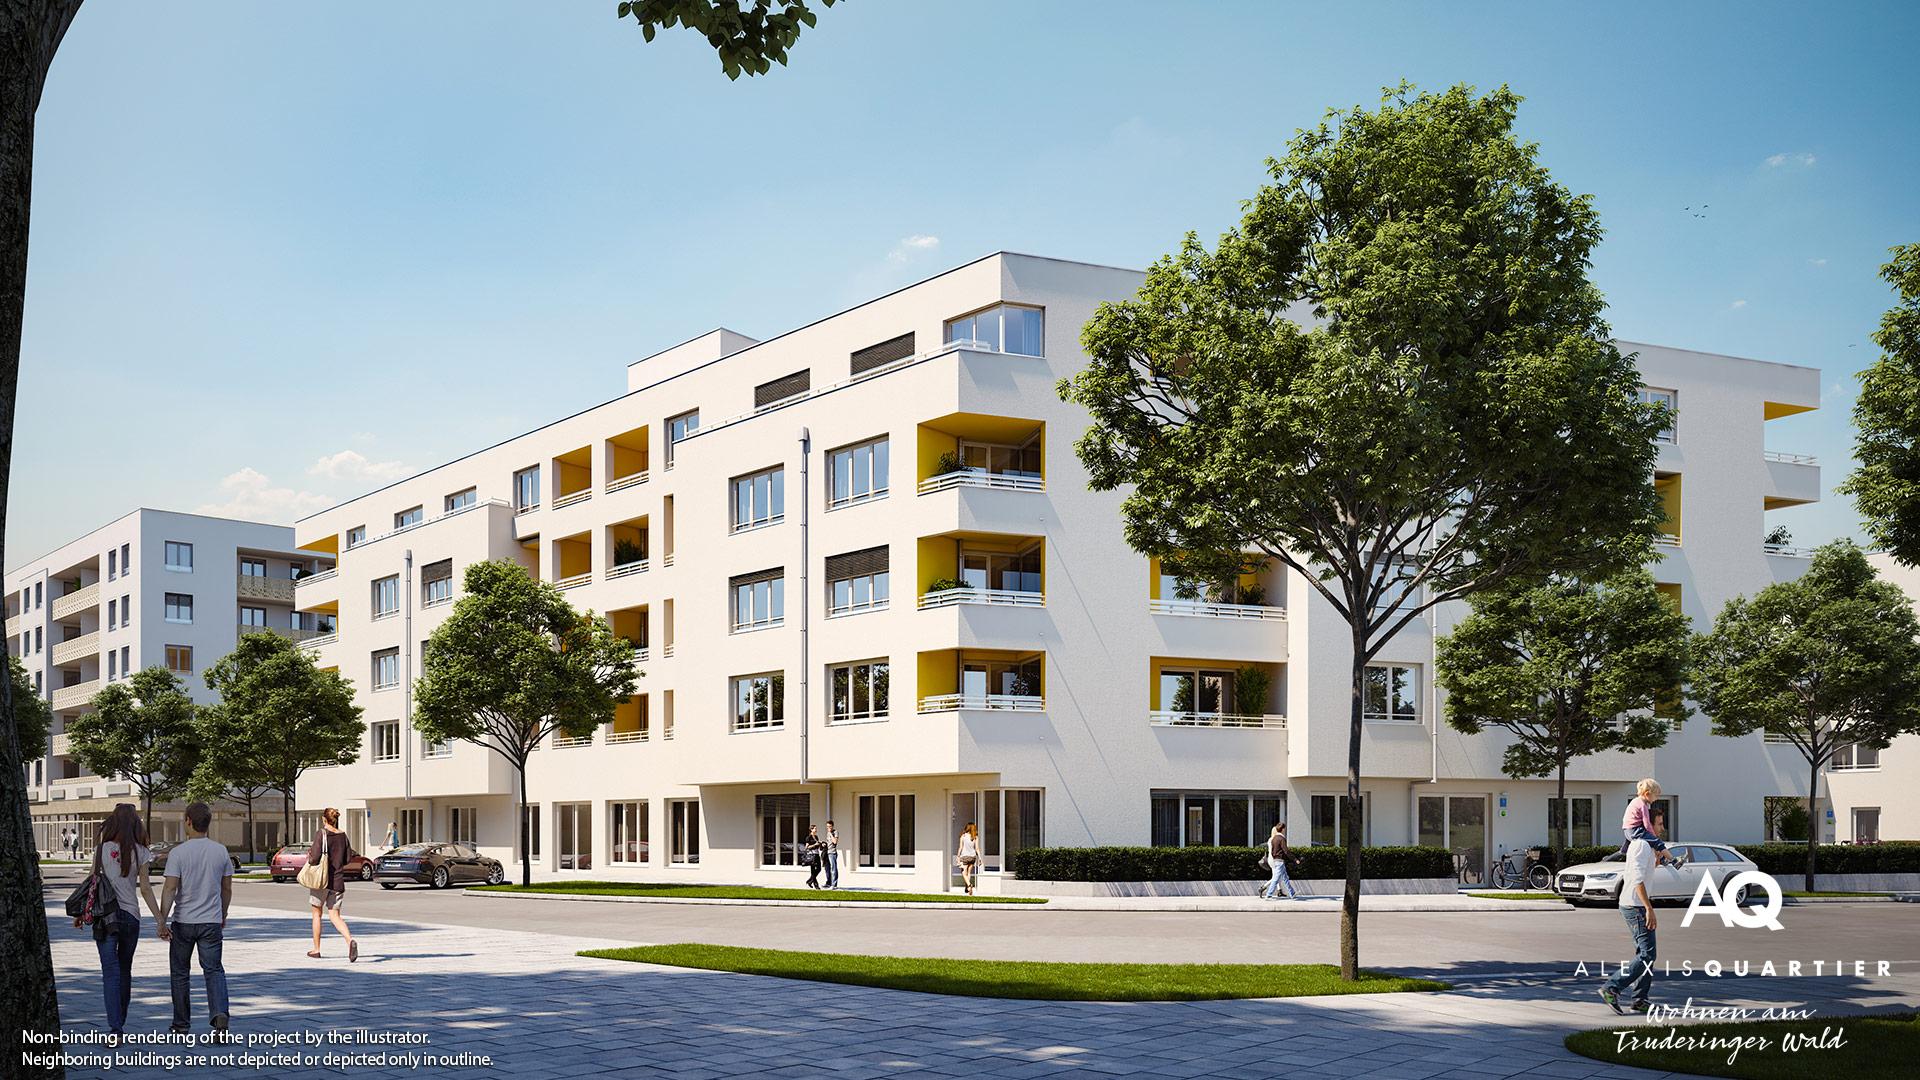 Property Alexisquartier Wohnen am Truderinger Wald - Illustration 1